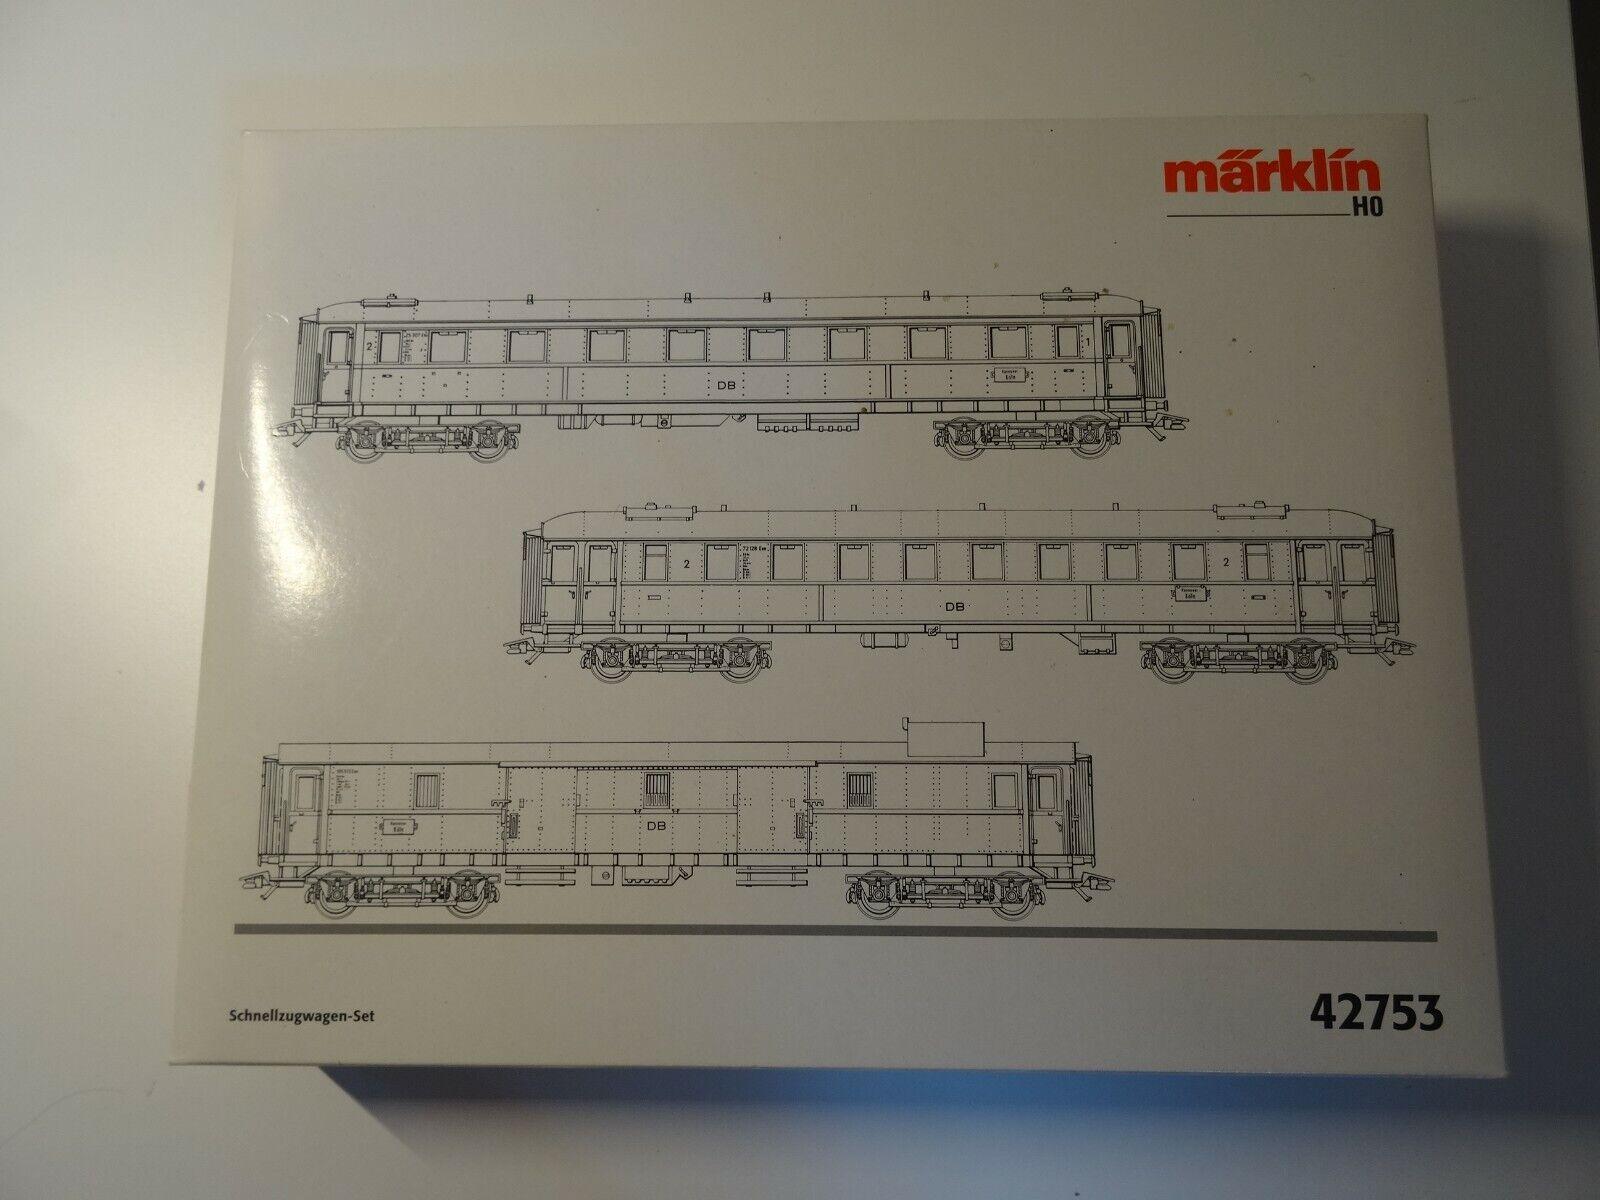 Marklin ho Art 43753 2er schnellzugwagenset de la DB Neuw embalaje original